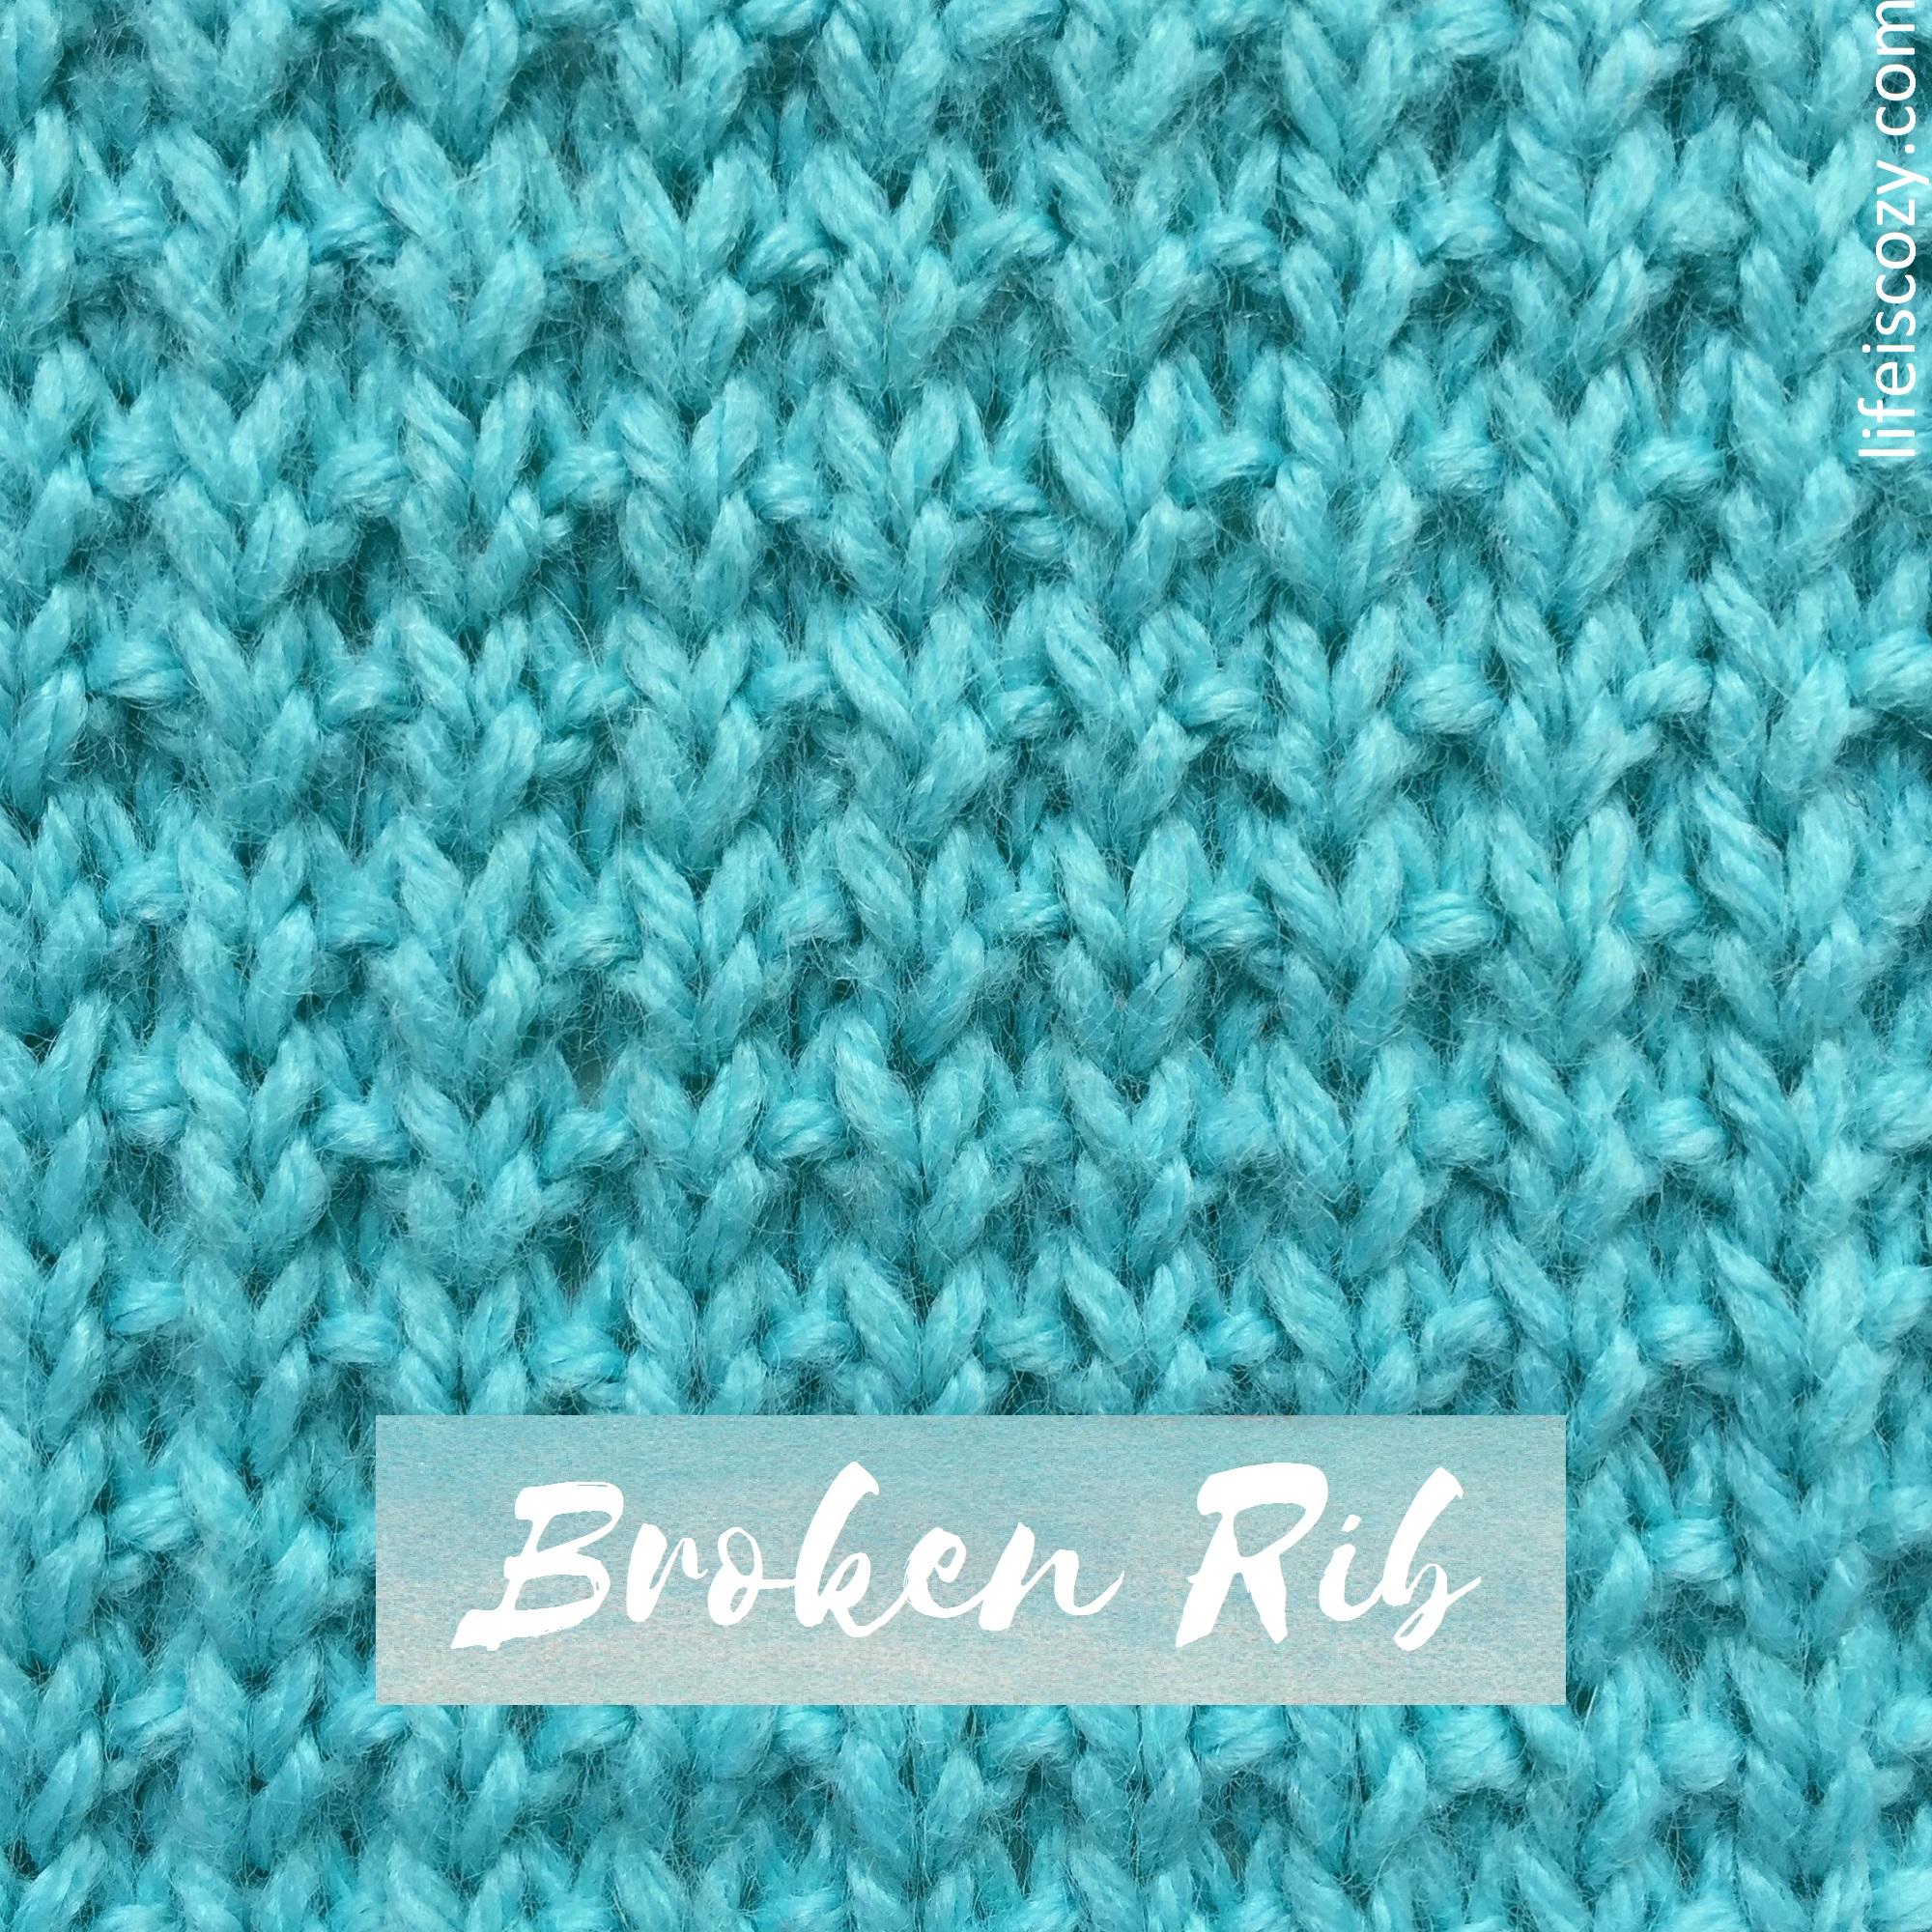 Broken Rib Stitch How to knit